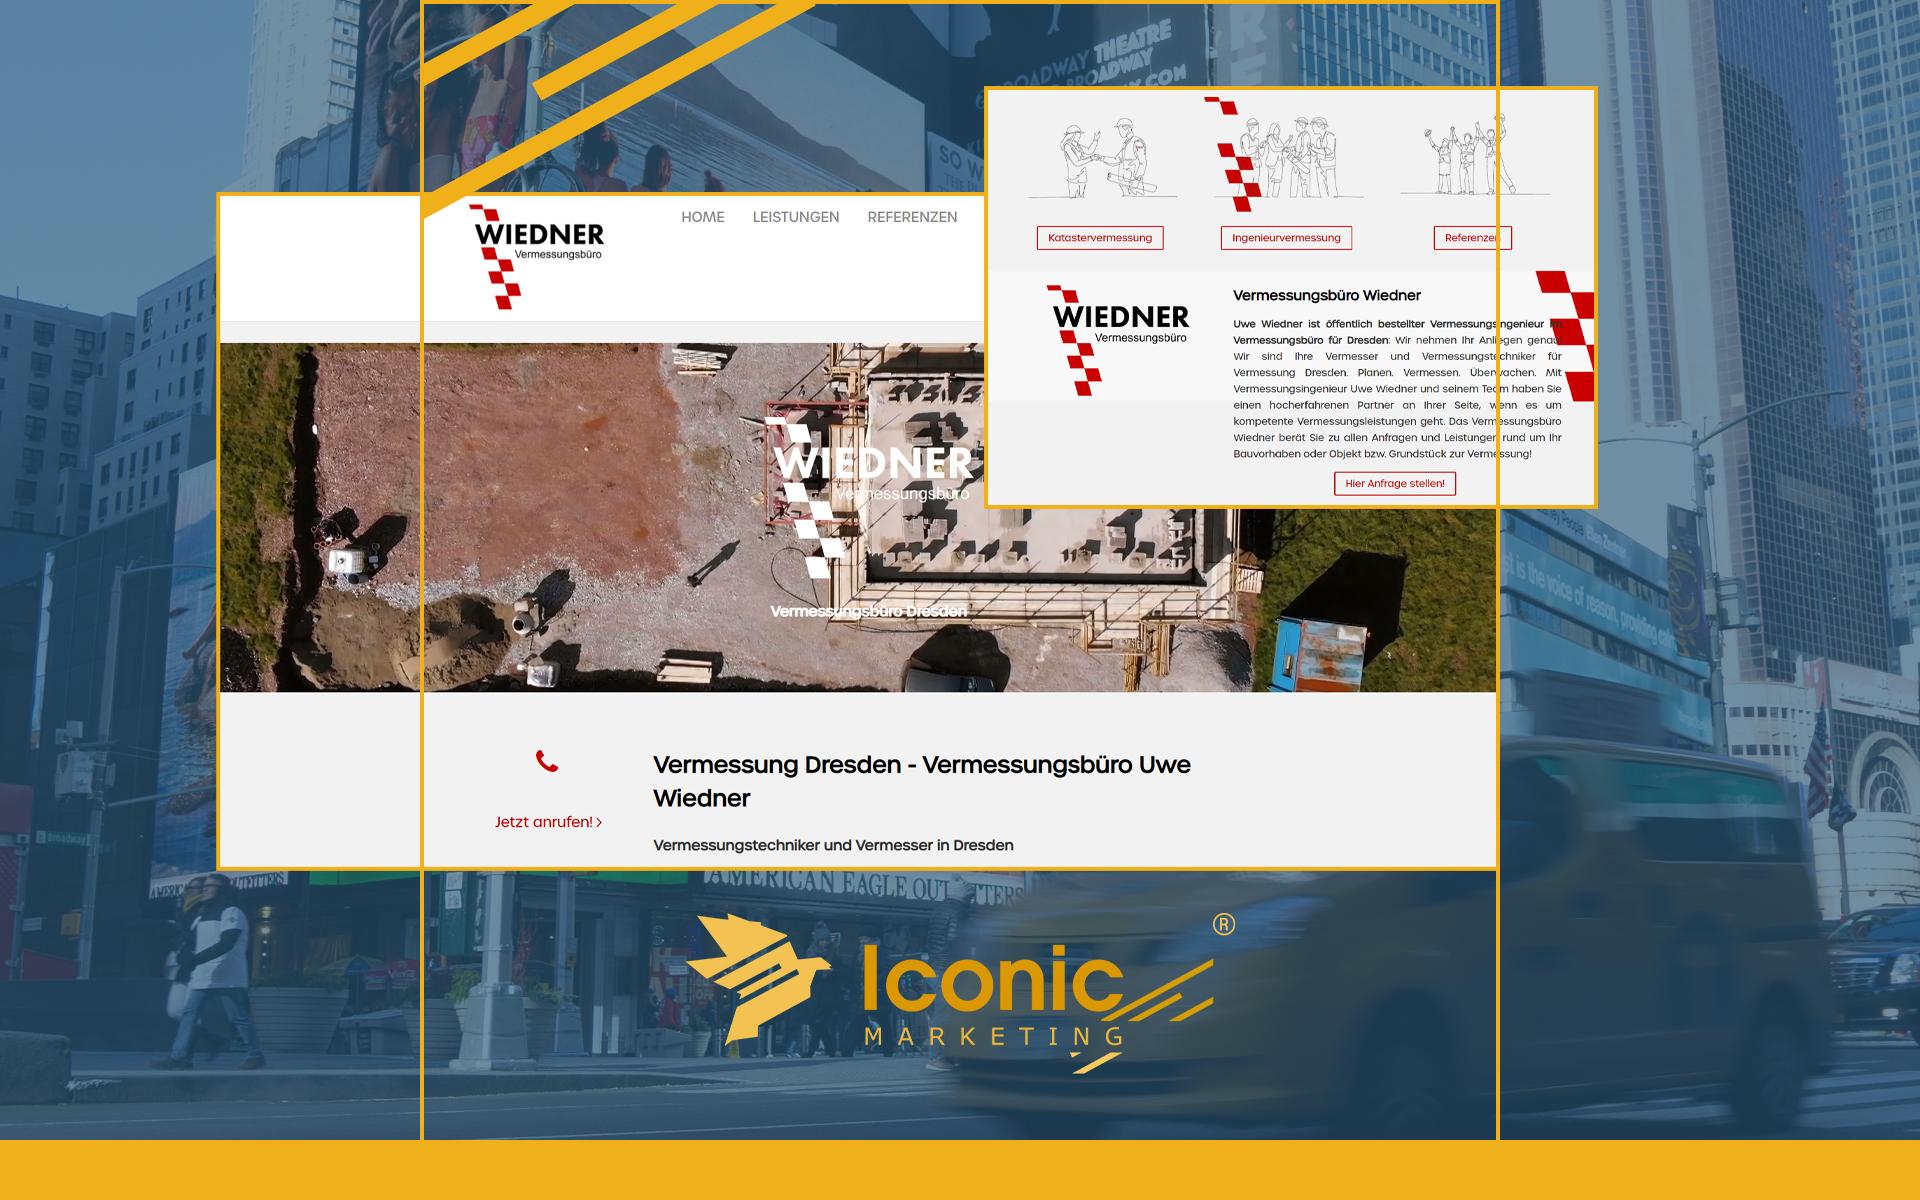 Iconic Marketing Prime betreut und pflegt Website